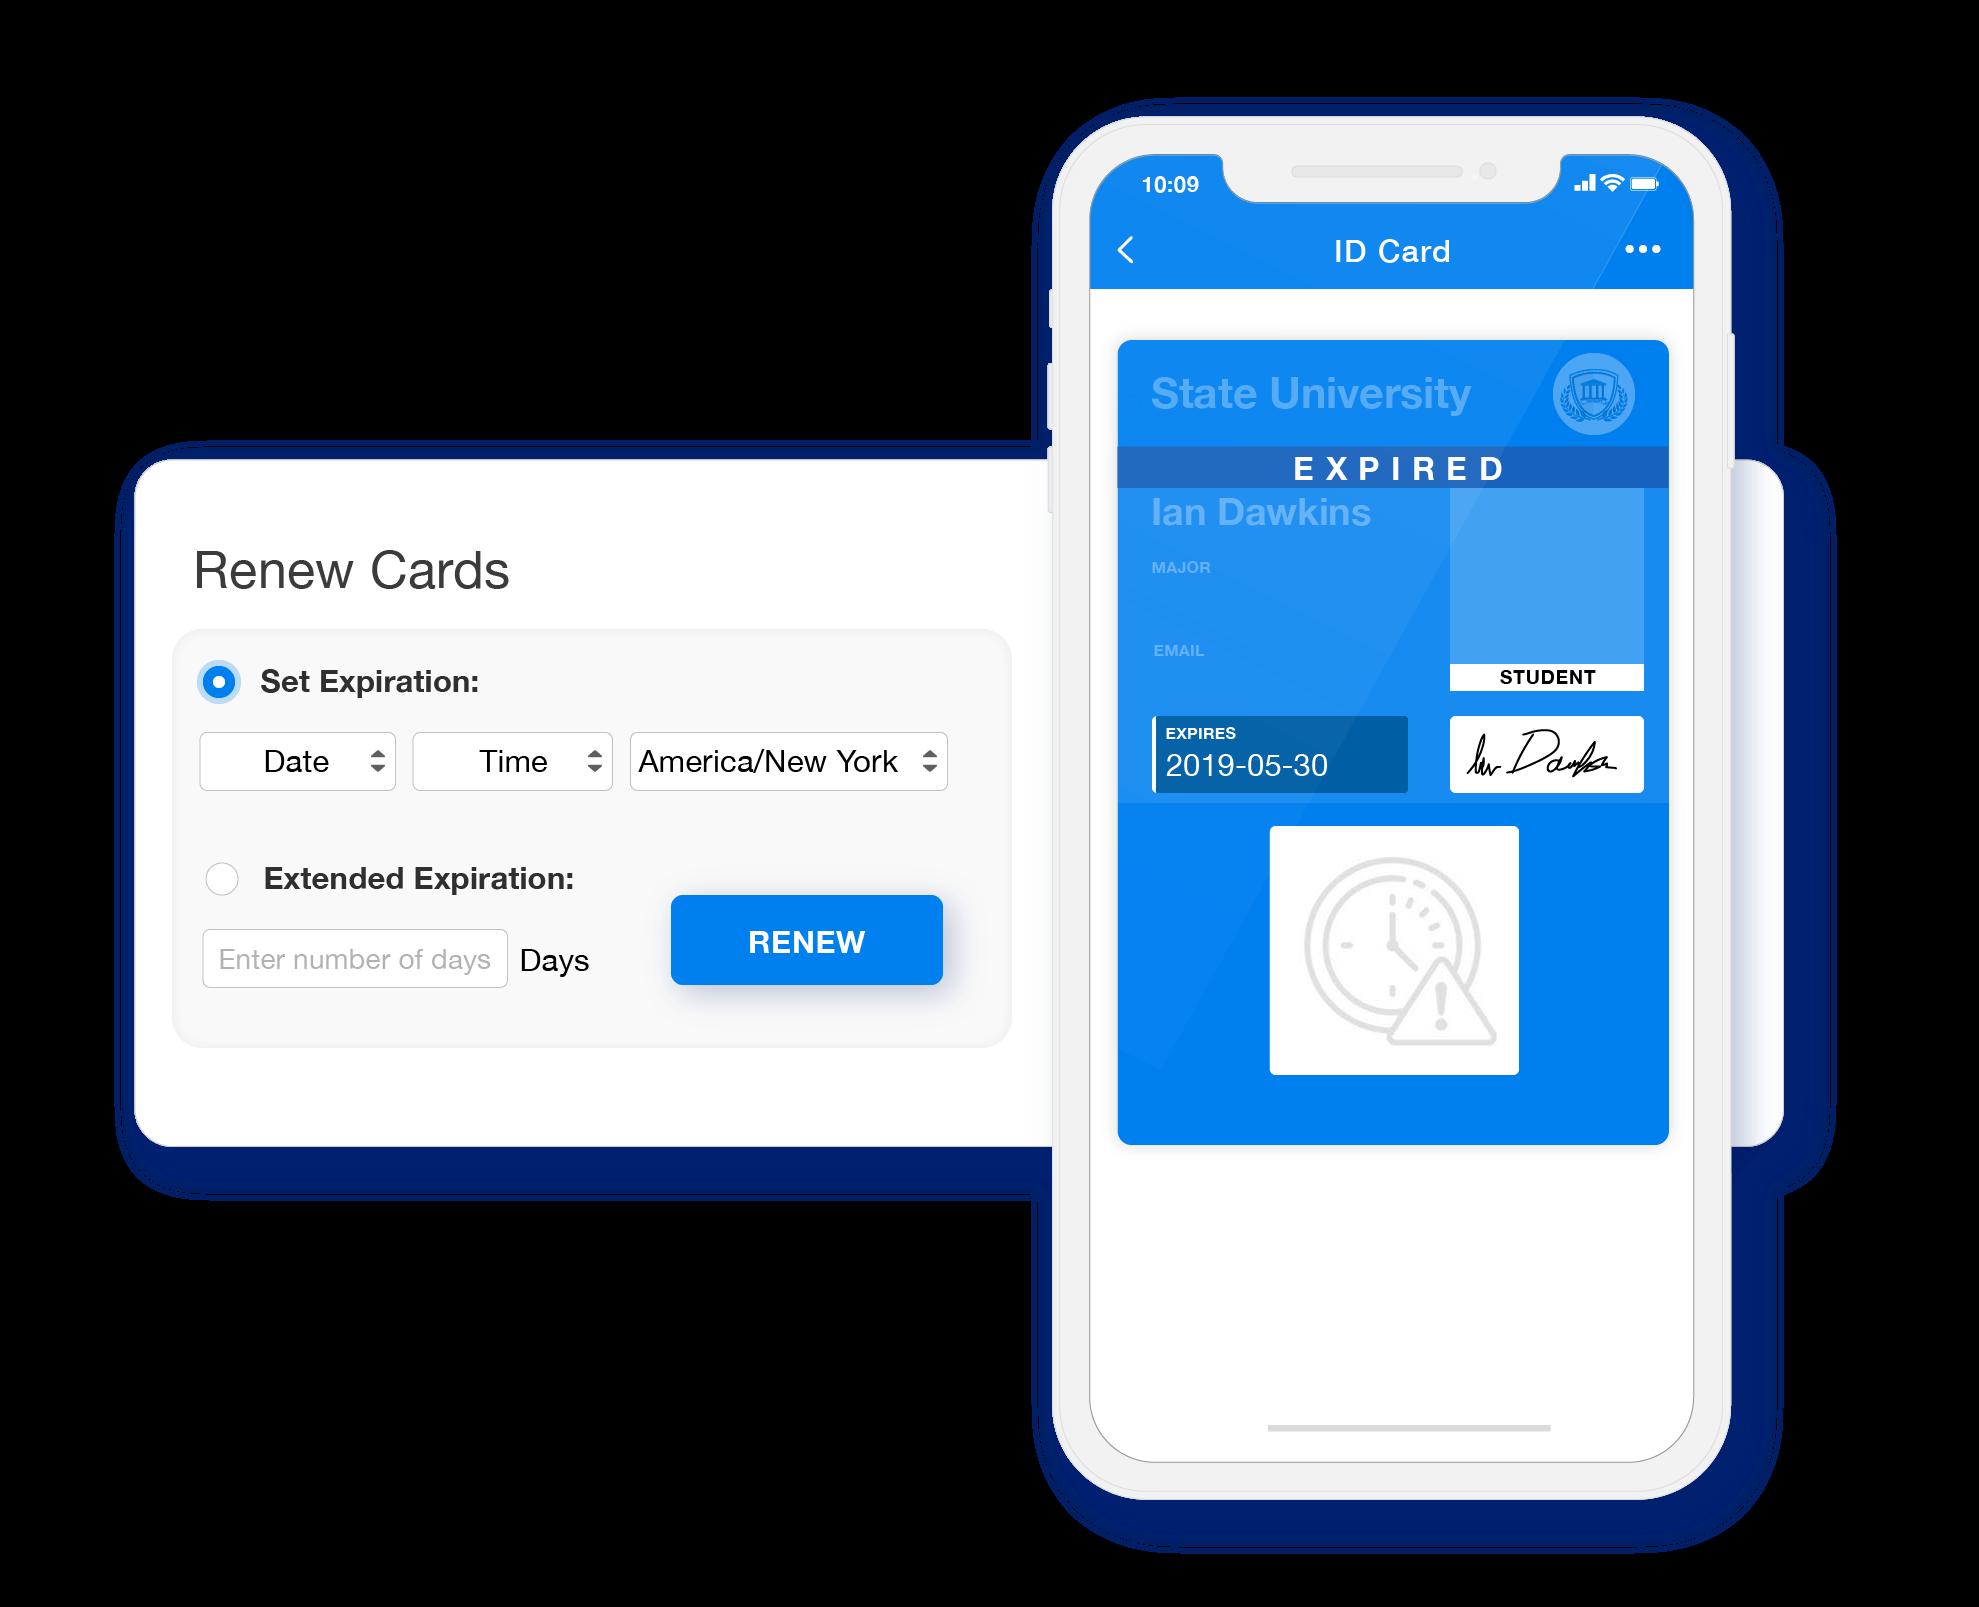 Renew expired digital ID cards